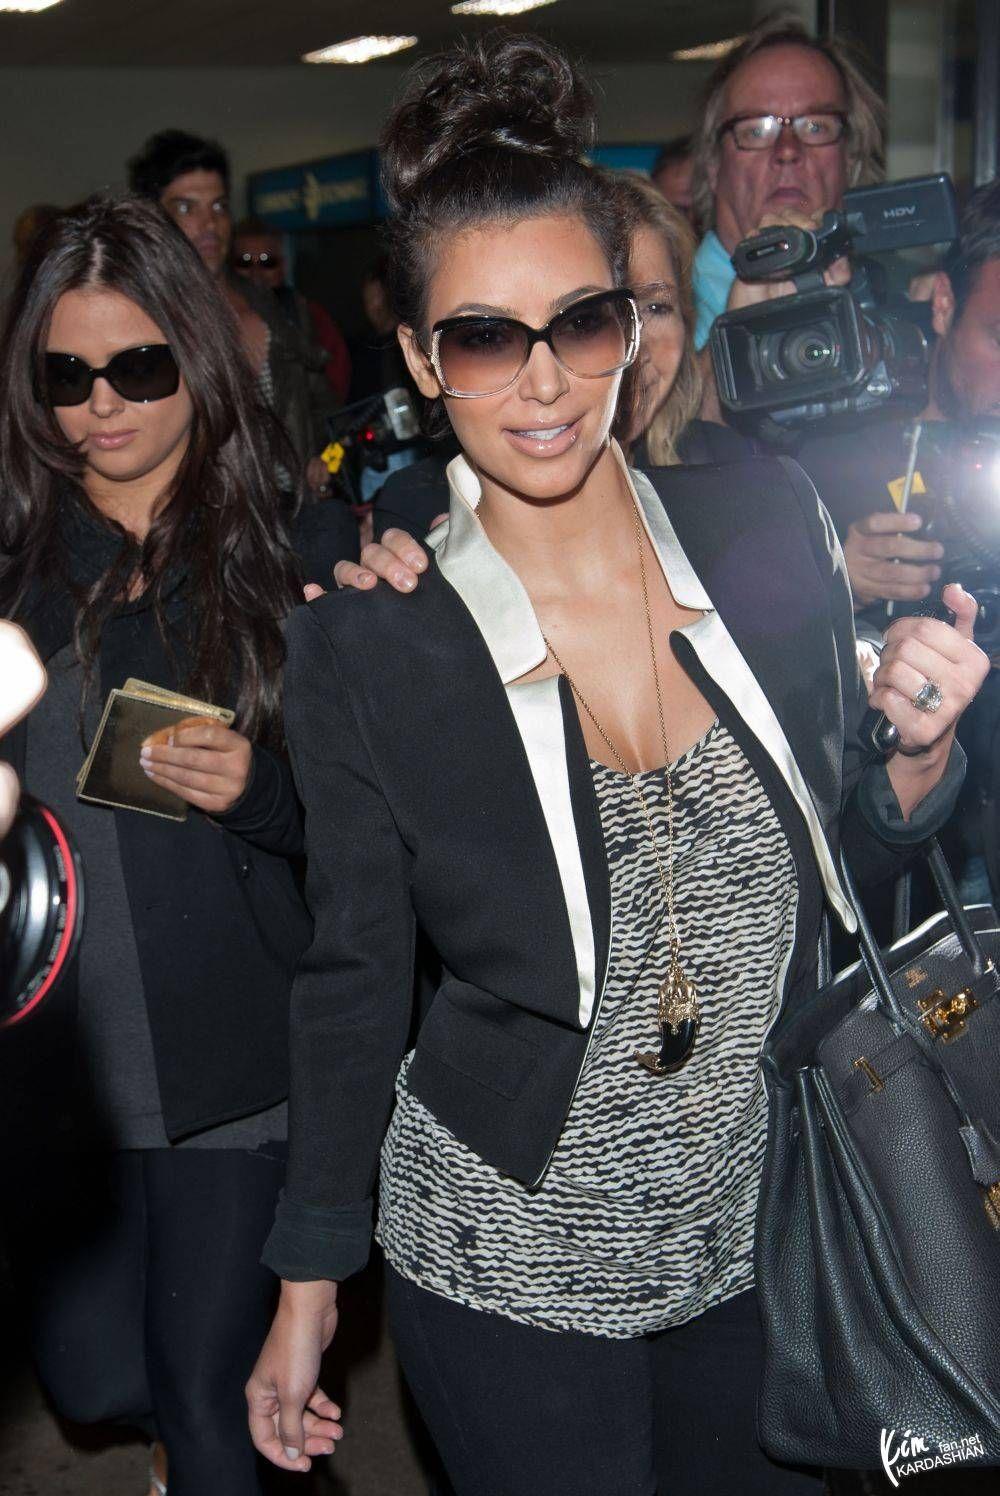 Khloe kardashian flannel shirt  Pin by Buffy FernandezAyala on Kardashian Khaos  Pinterest